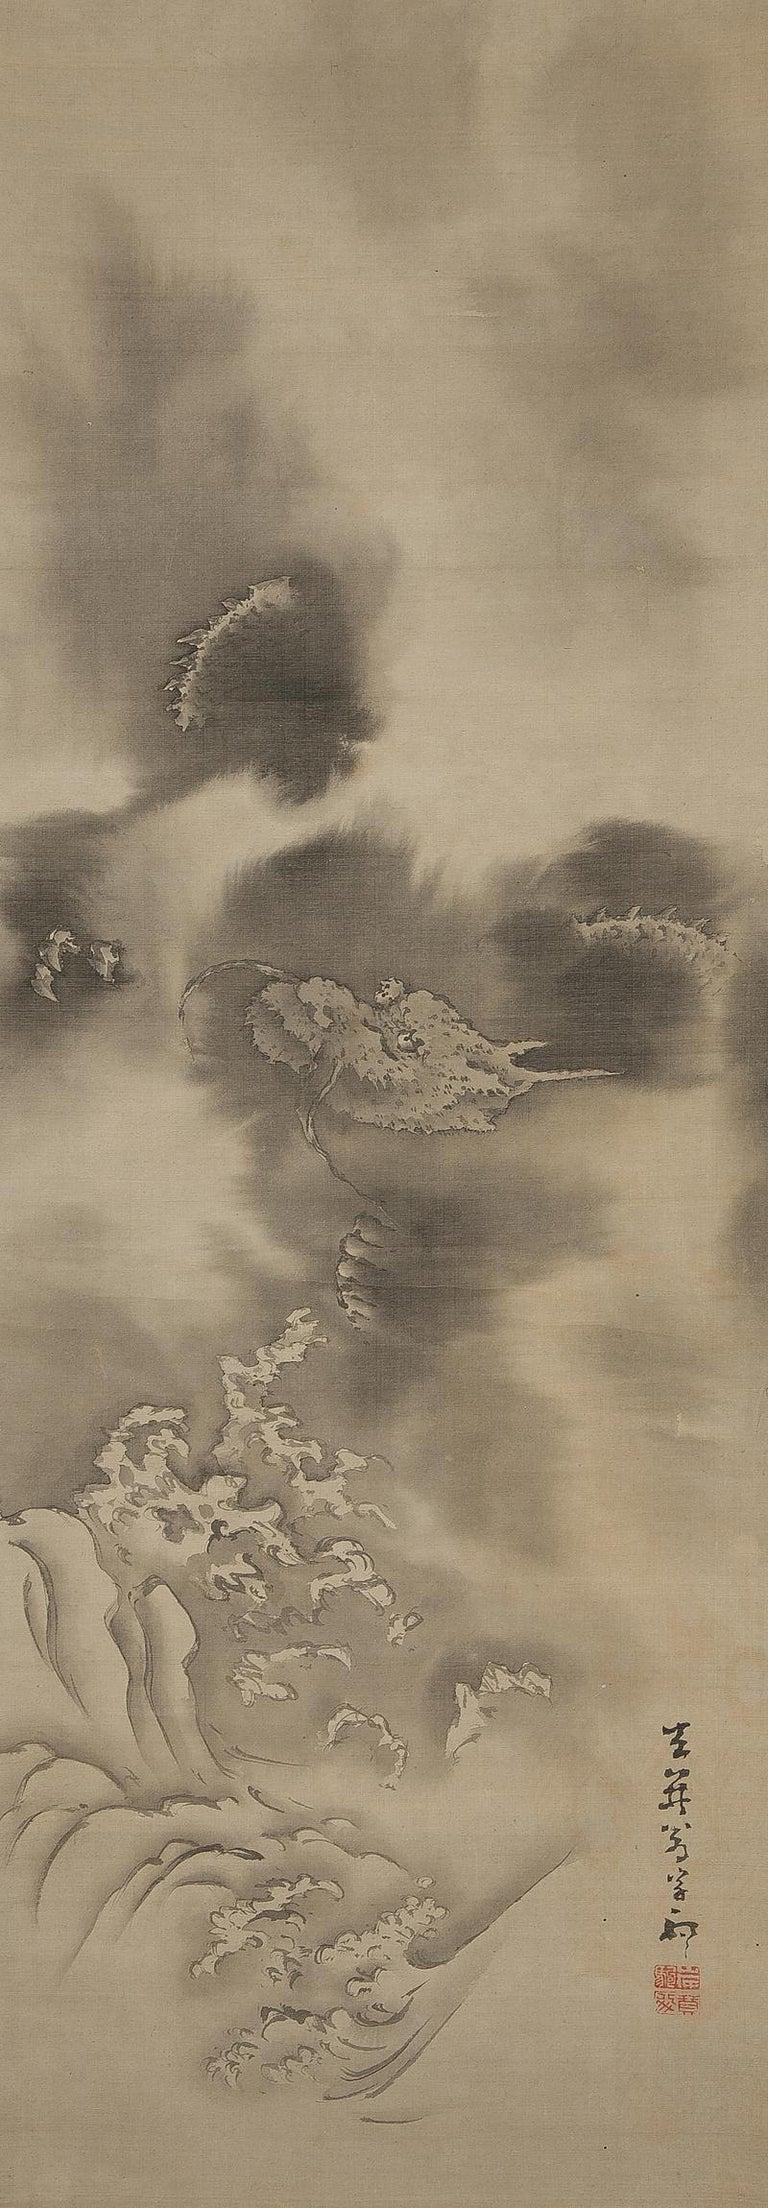 Lovely Edo Period Scroll Paintings Japan Artist Saeki Kishi Ganku Dragon Clouds For Sale 2